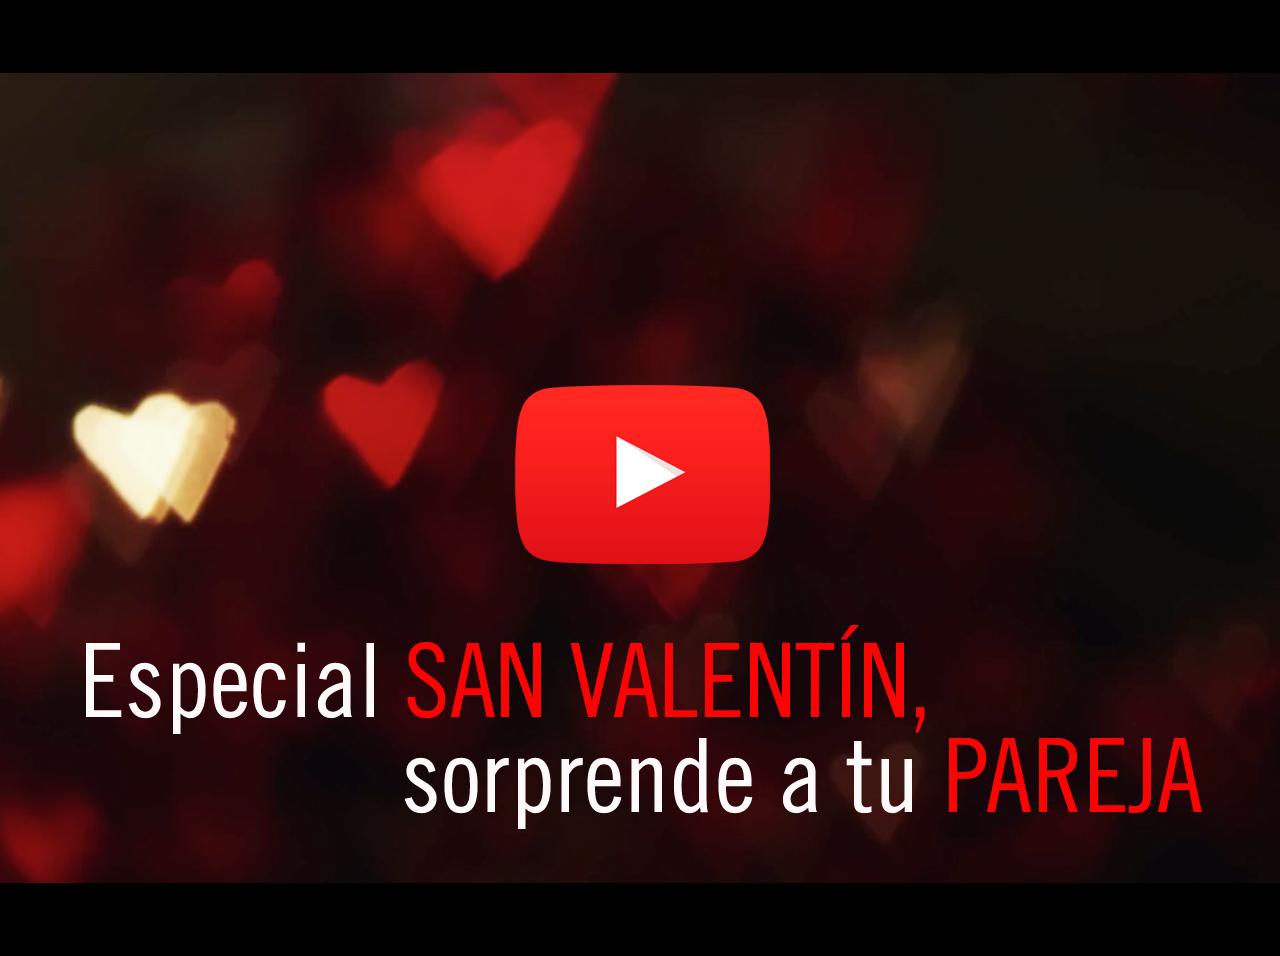 Cena especial de San Valentín para sorprender a tu pareja